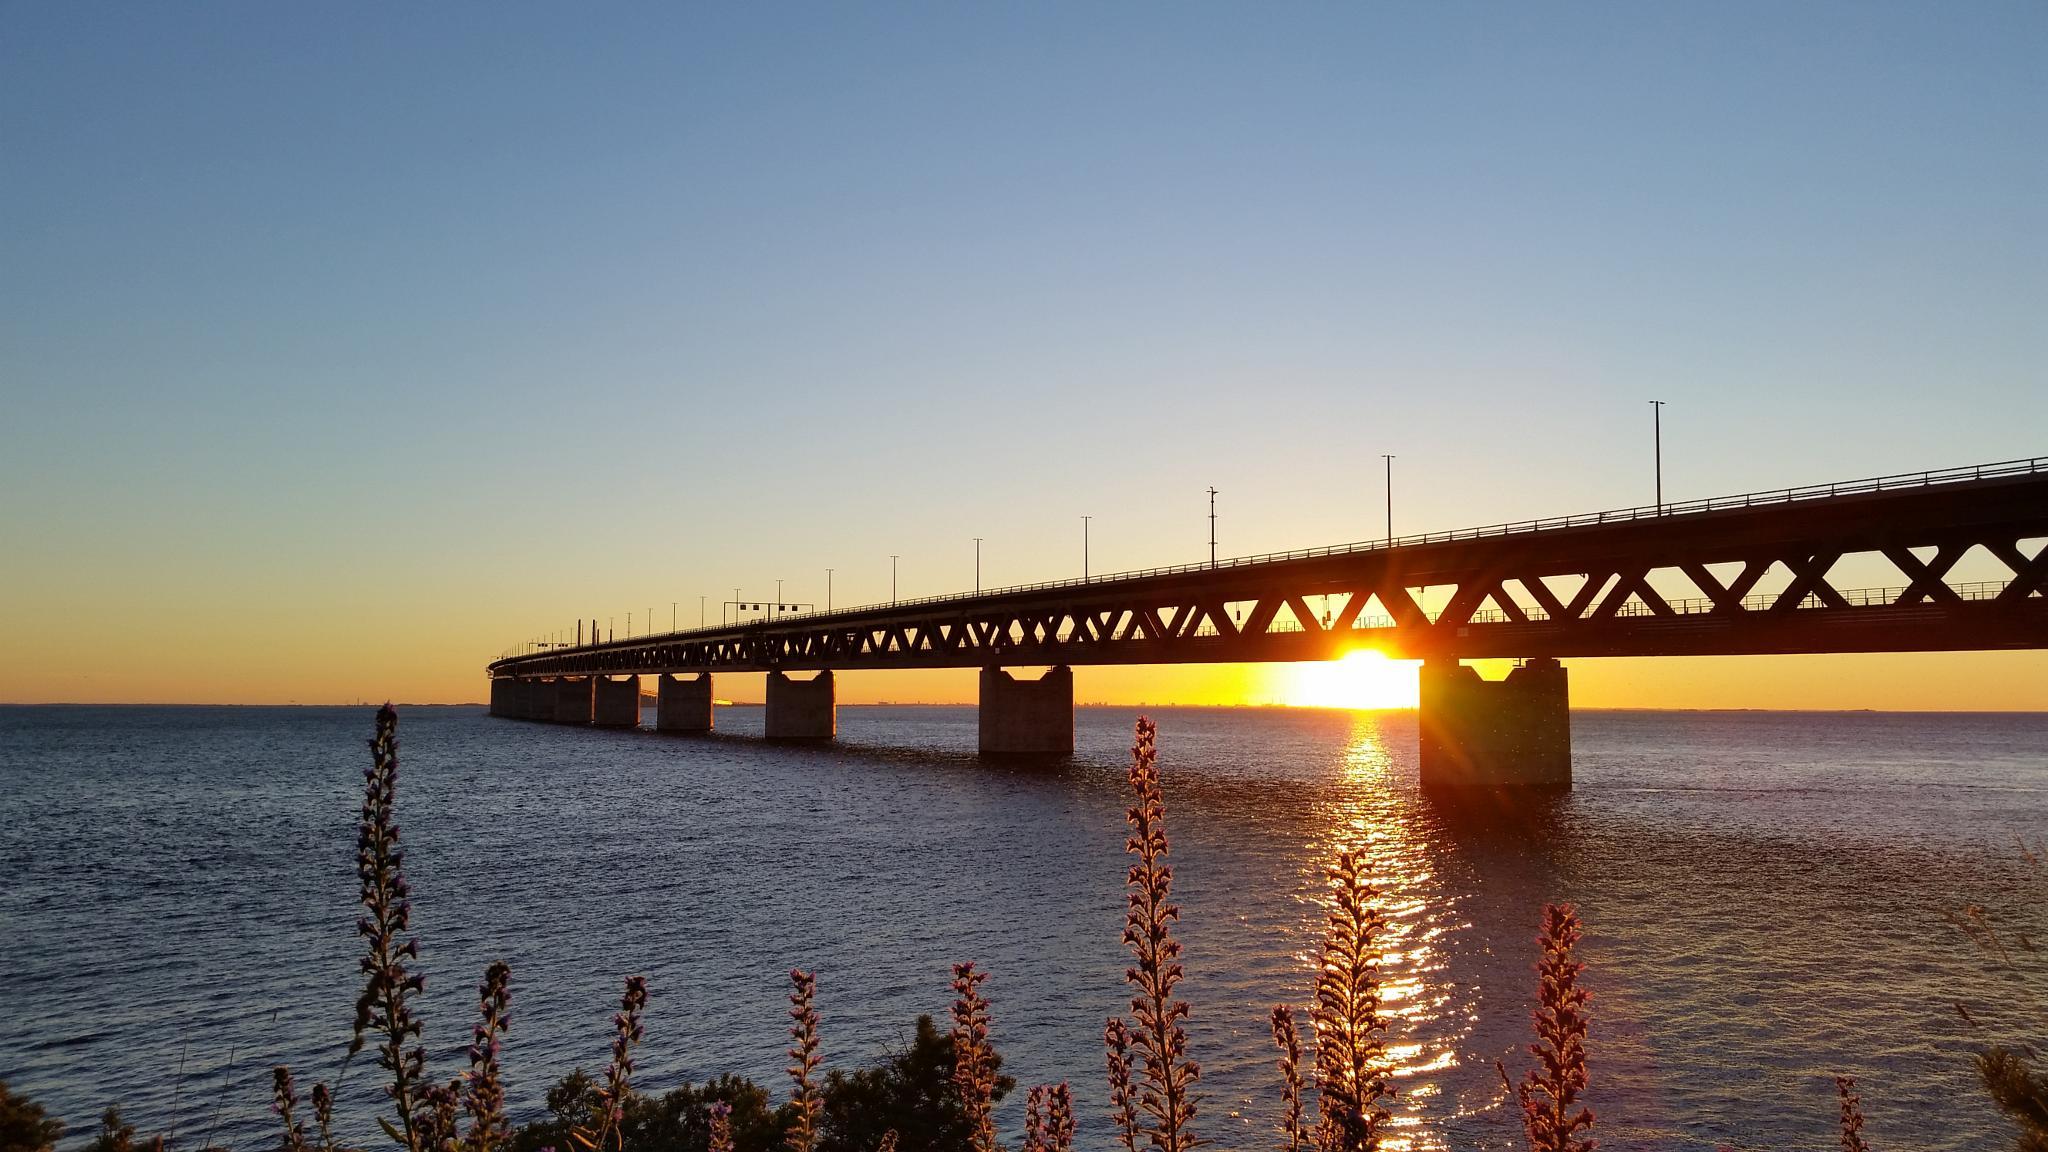 Öresundsbron at sunset by Ashkan Baharlooe